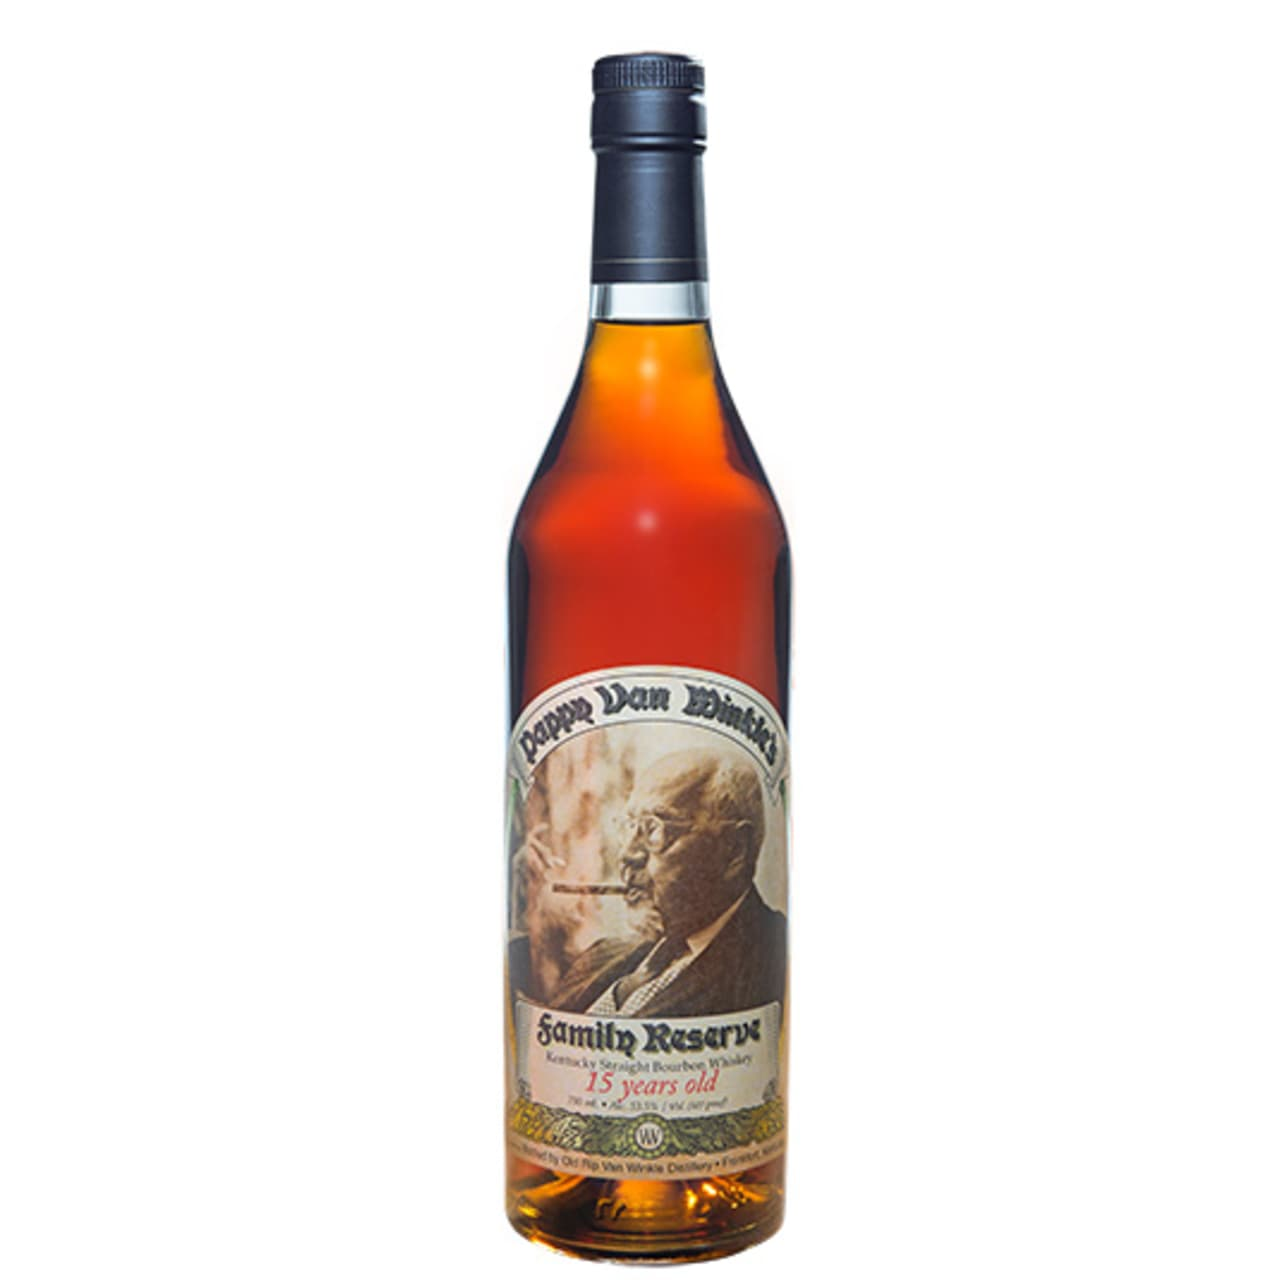 Product Image - Pappy Van Winkle's Family Reserve 15yo Bourbon